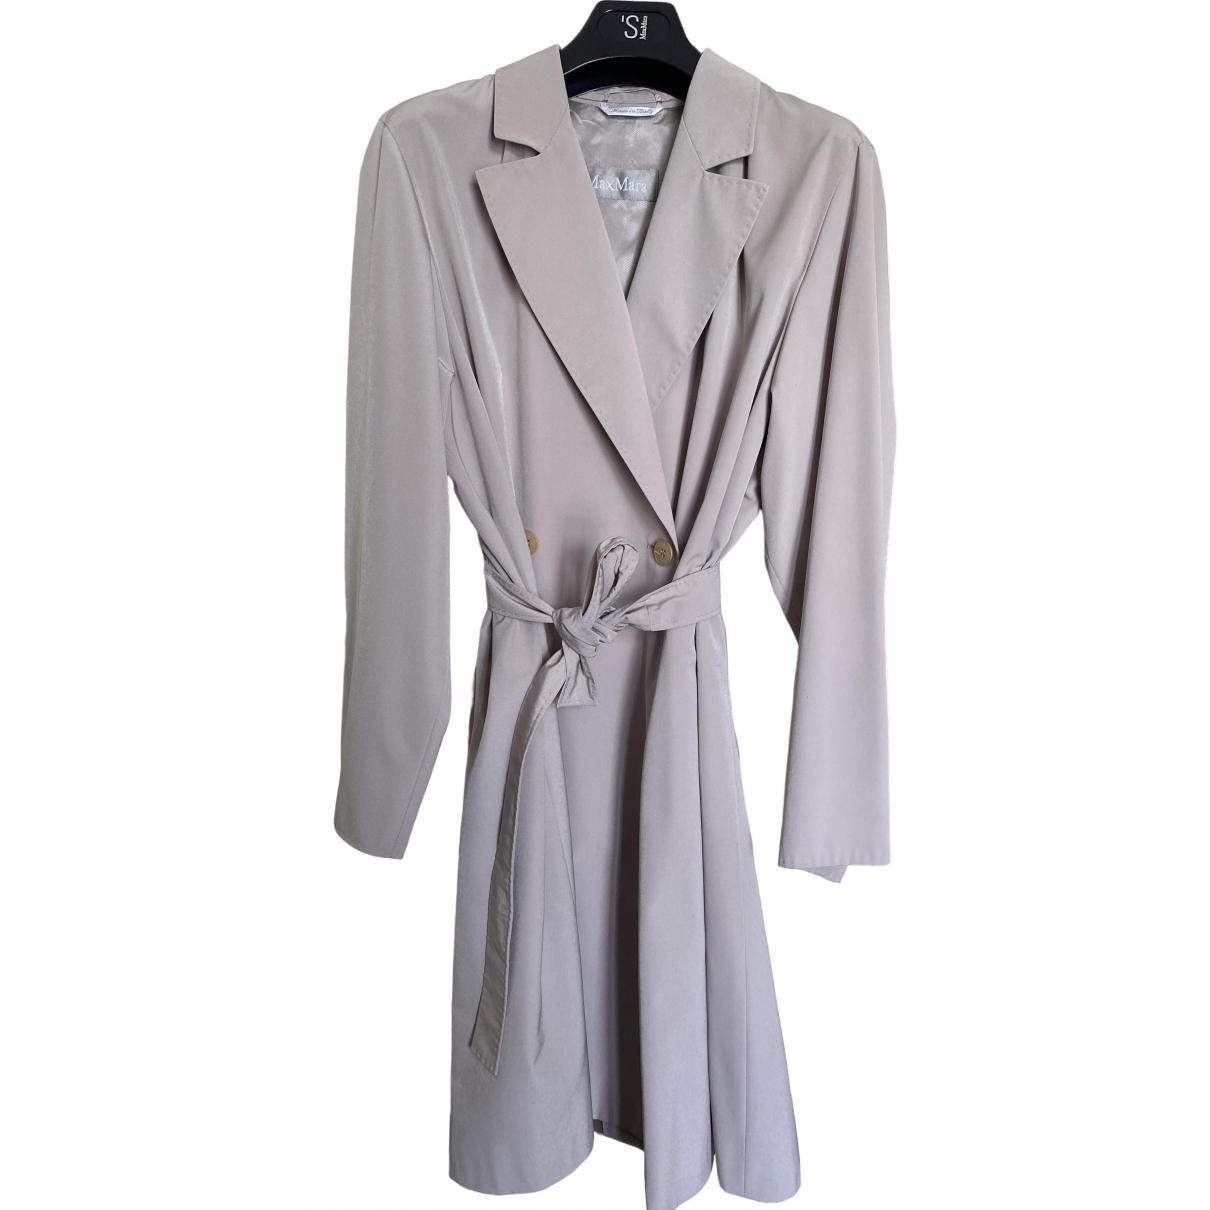 Max Mara \N Grey Trench coat for Women 36 FR